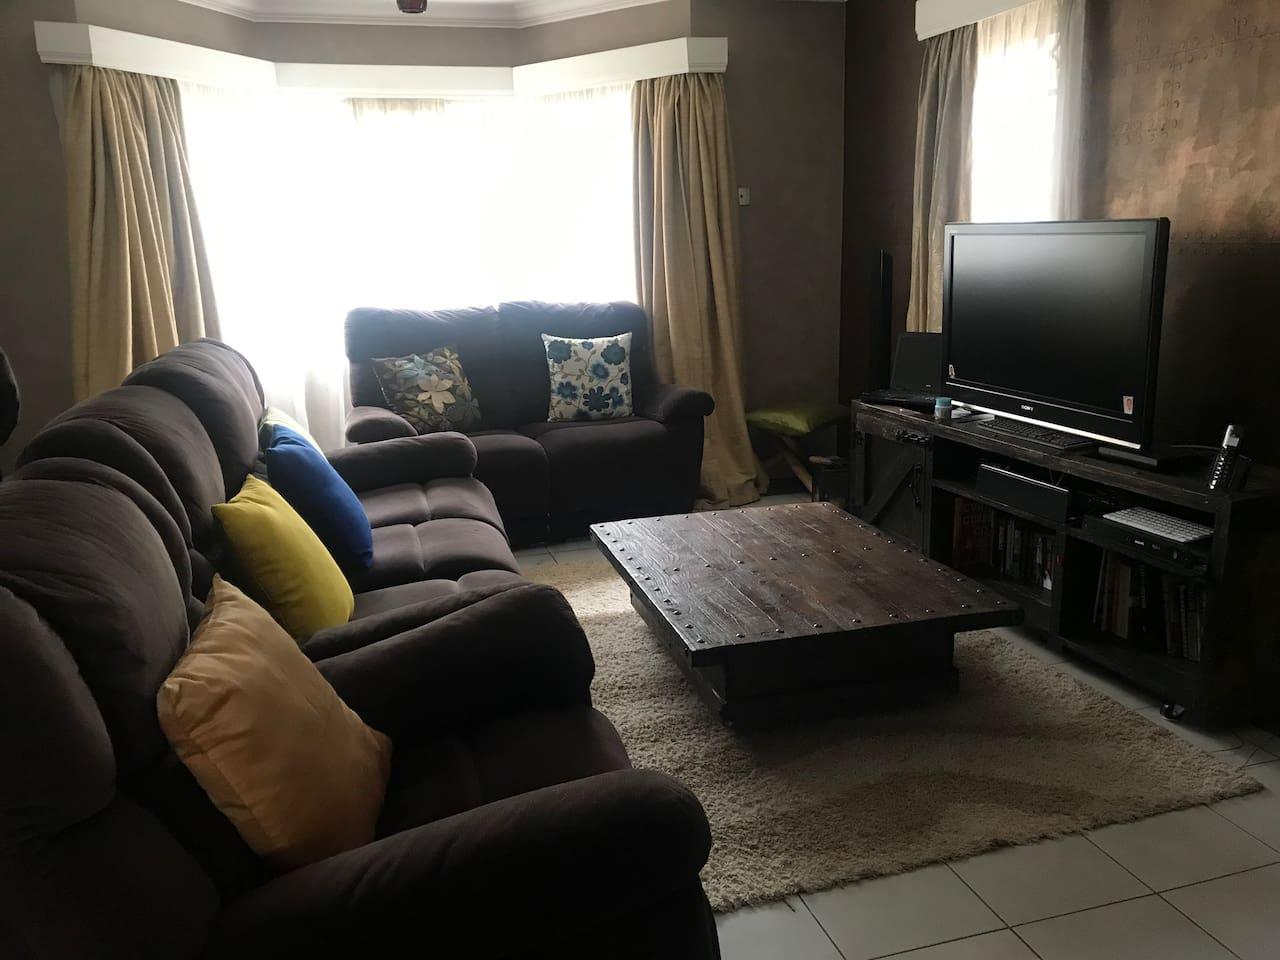 Relaxing living room with rustic decòr